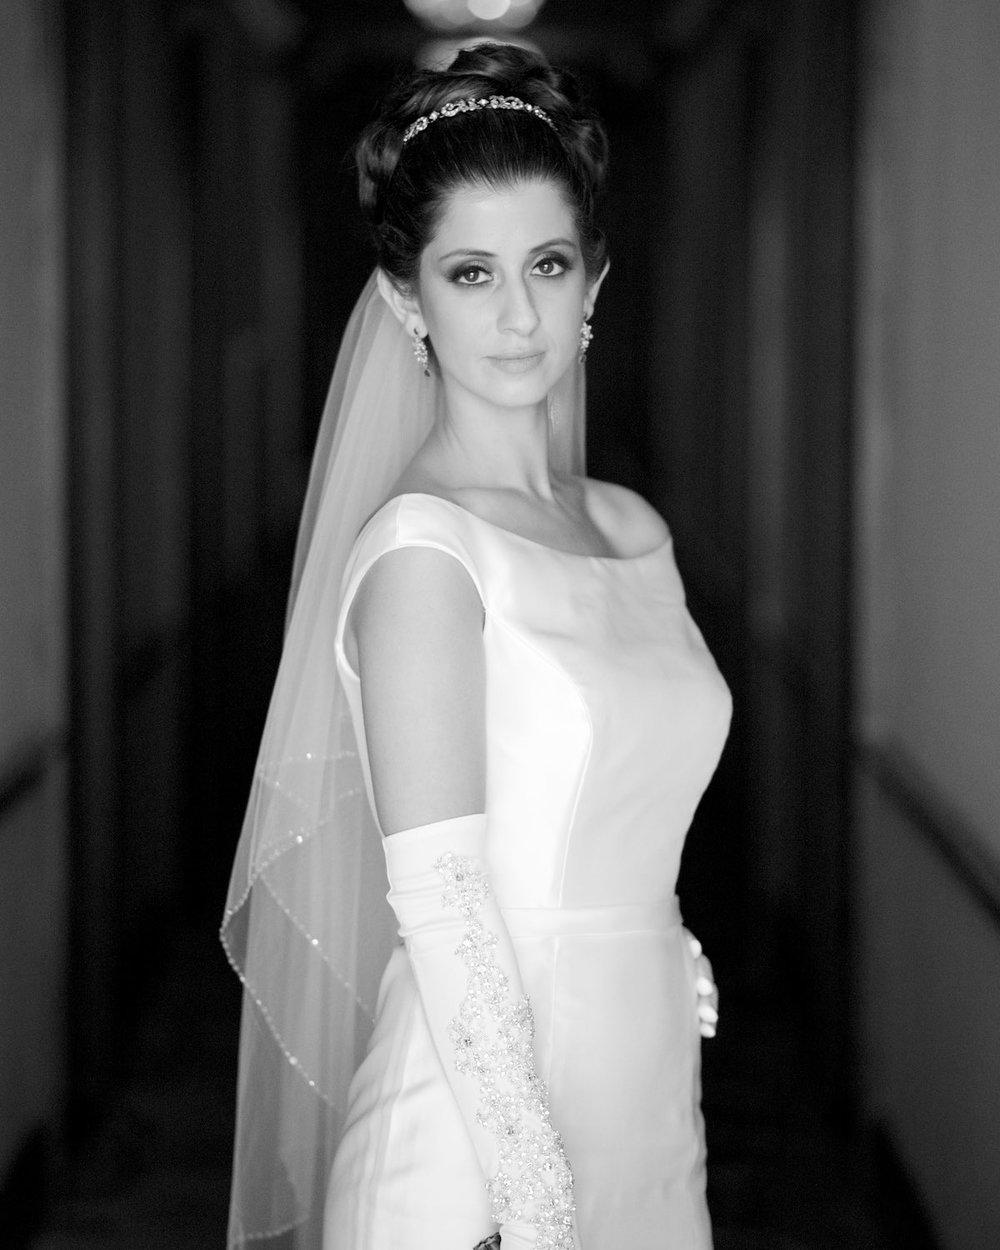 la-valencia-wedding-michal-pfeil-23.jpg